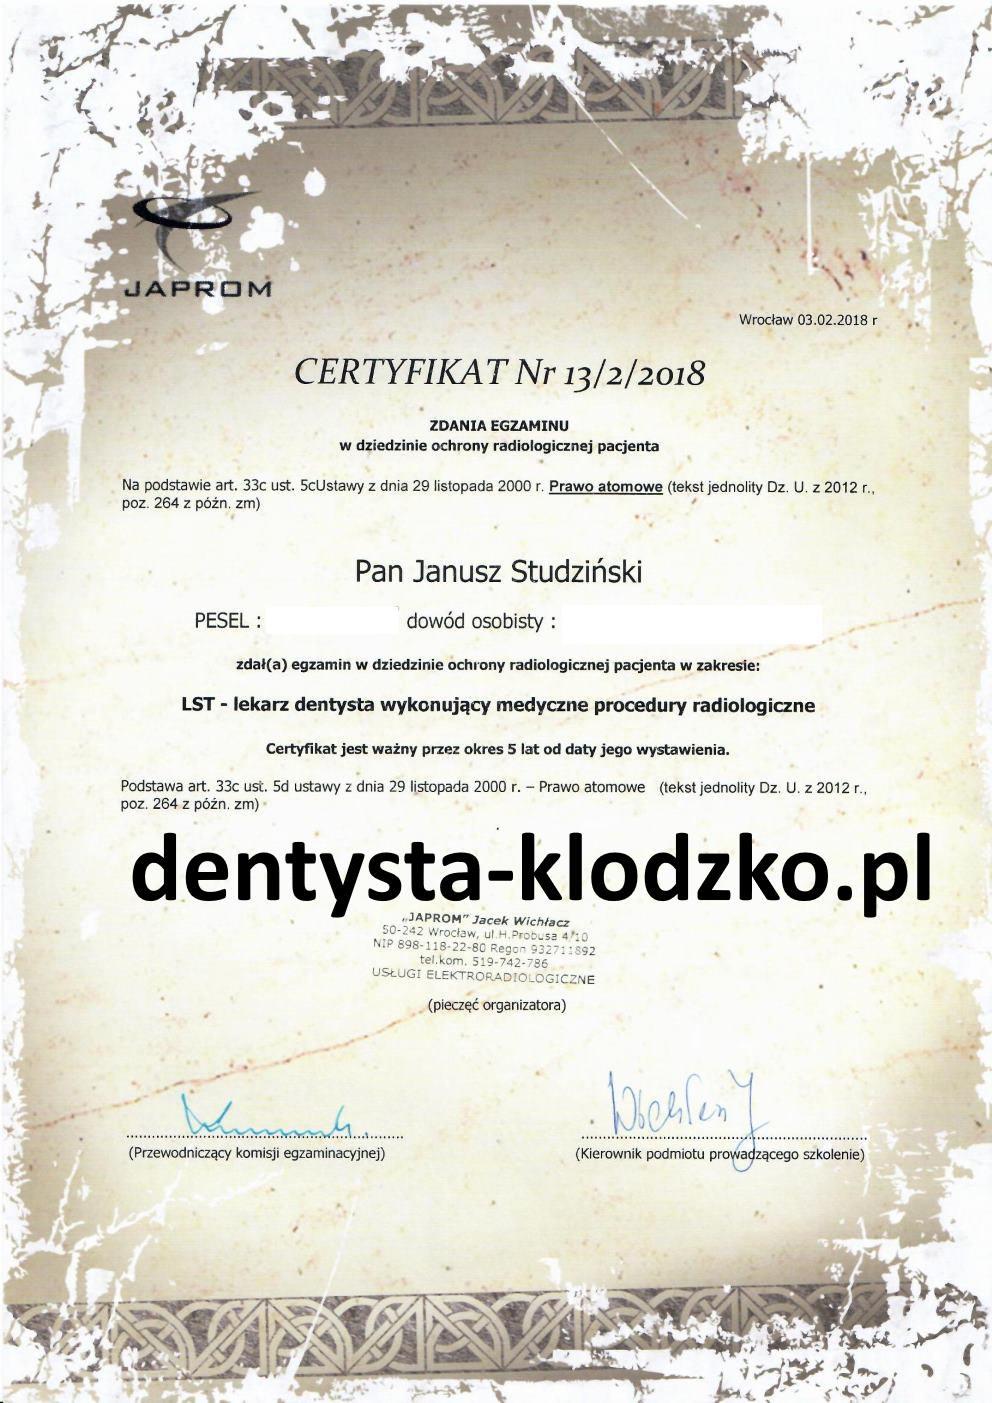 radiologia-certyfikat